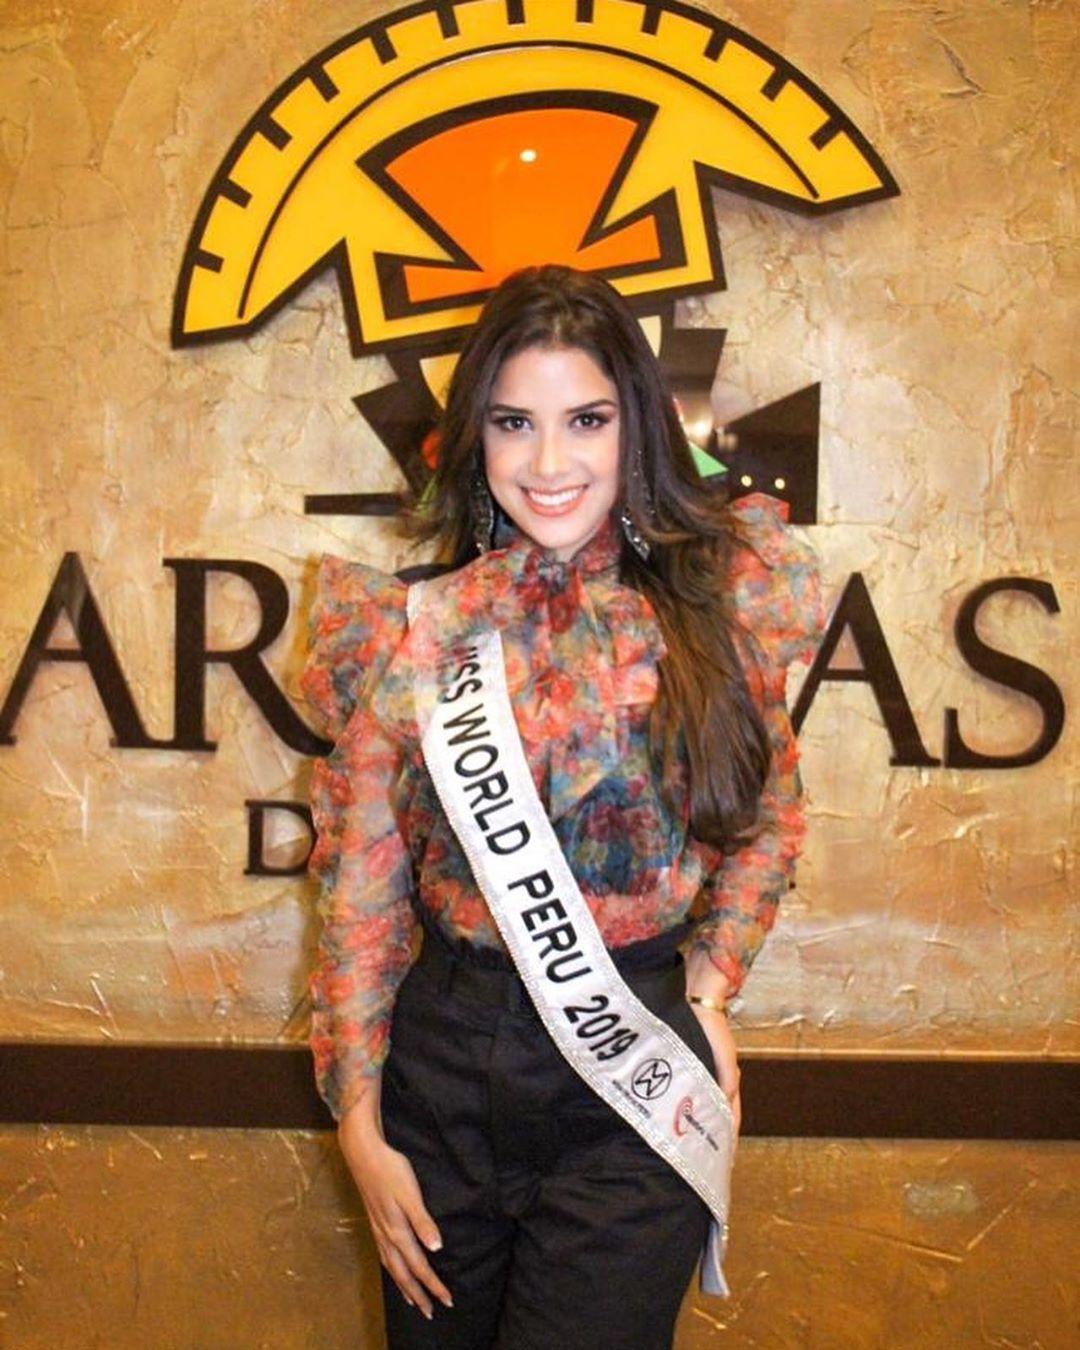 angella escudero, miss world peru 2019. - Página 2 70582410